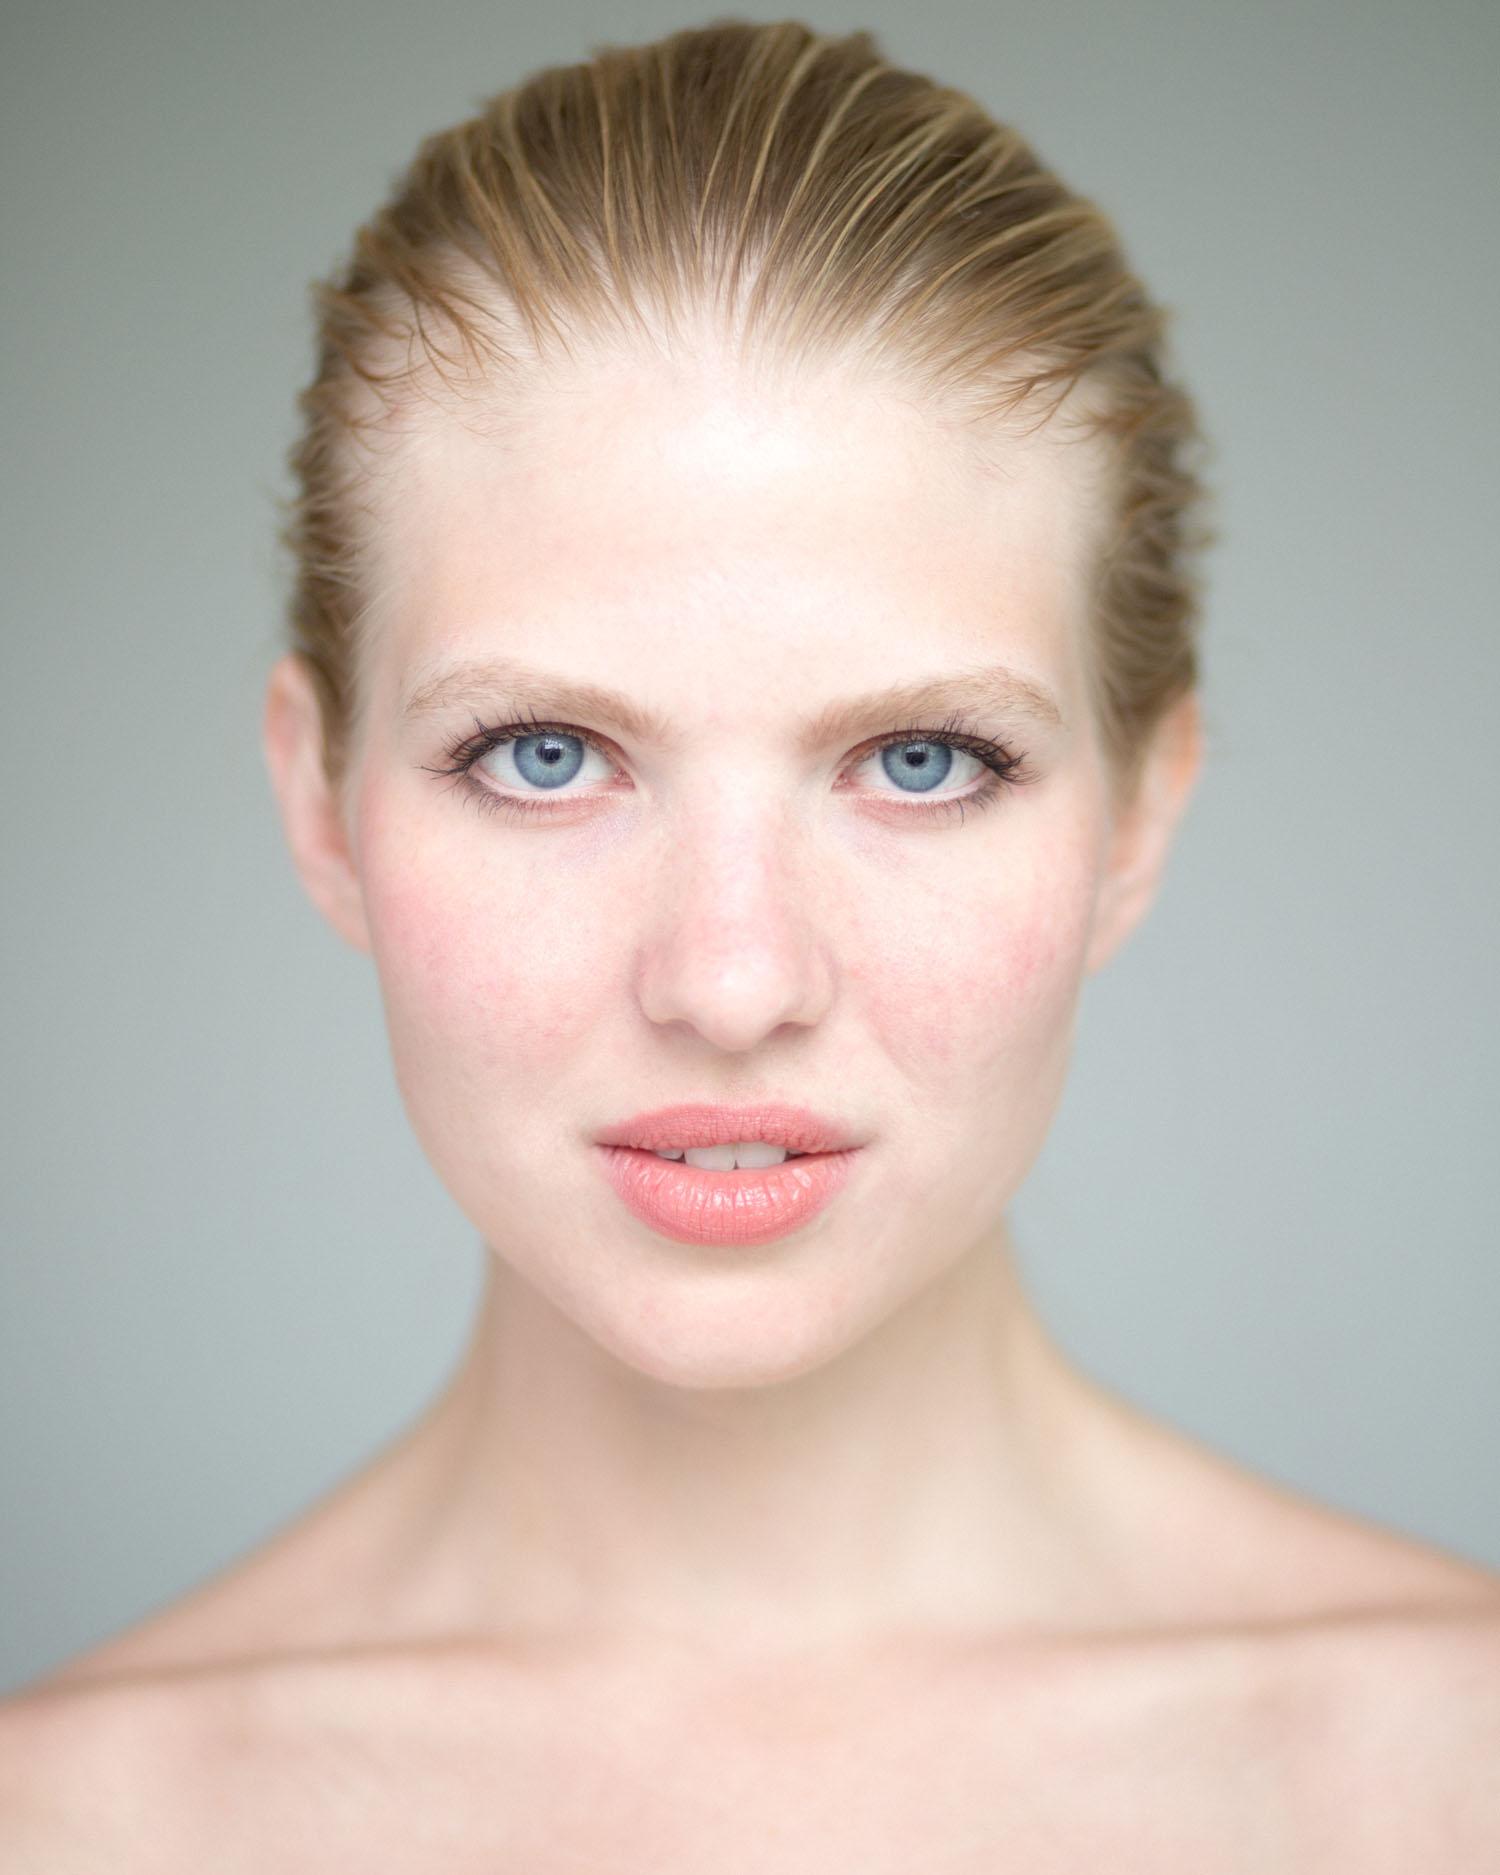 Mark Laubenheimer Photography